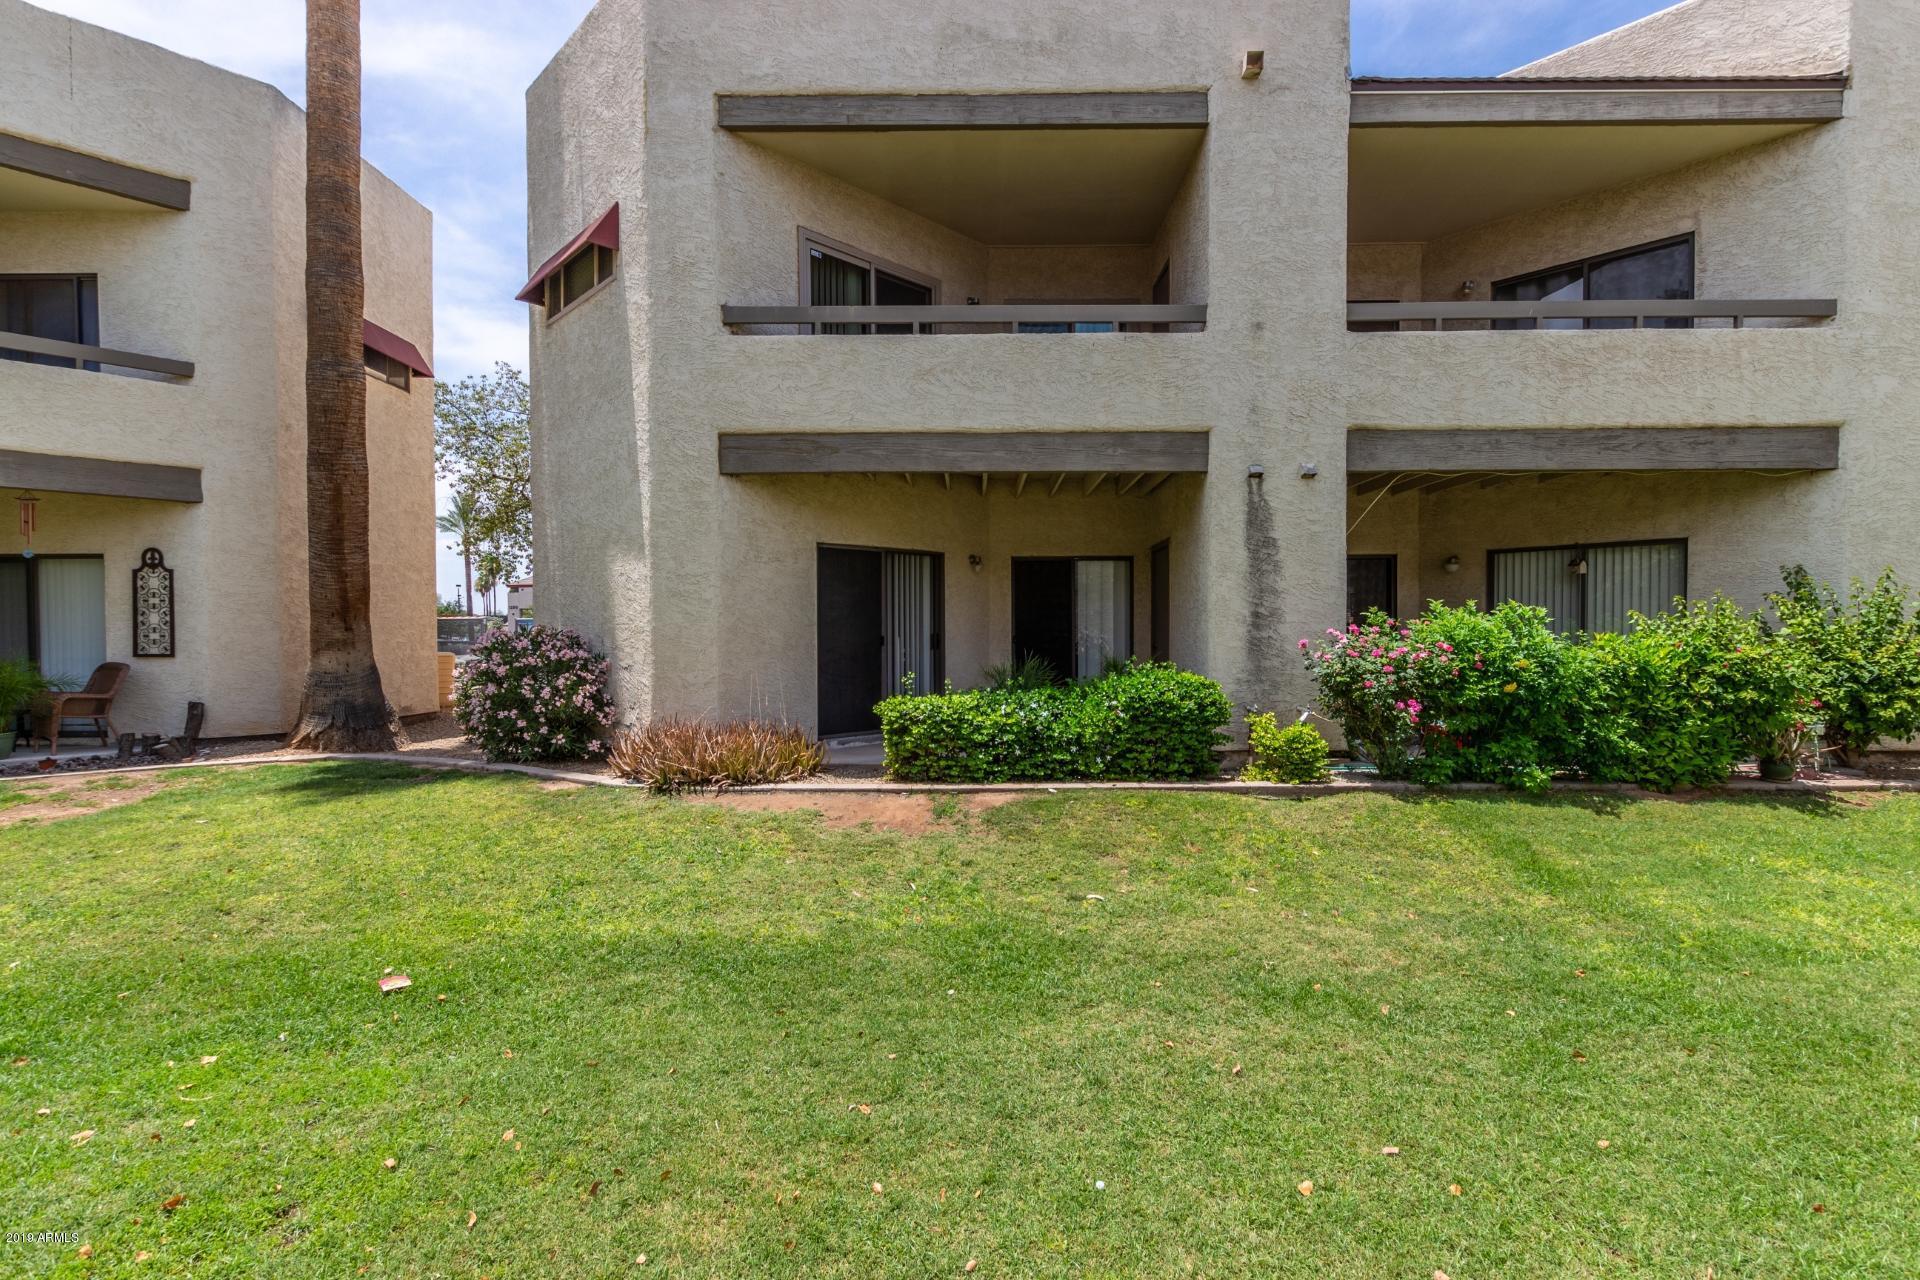 Photo of 1287 N ALMA SCHOOL Road #109, Chandler, AZ 85224